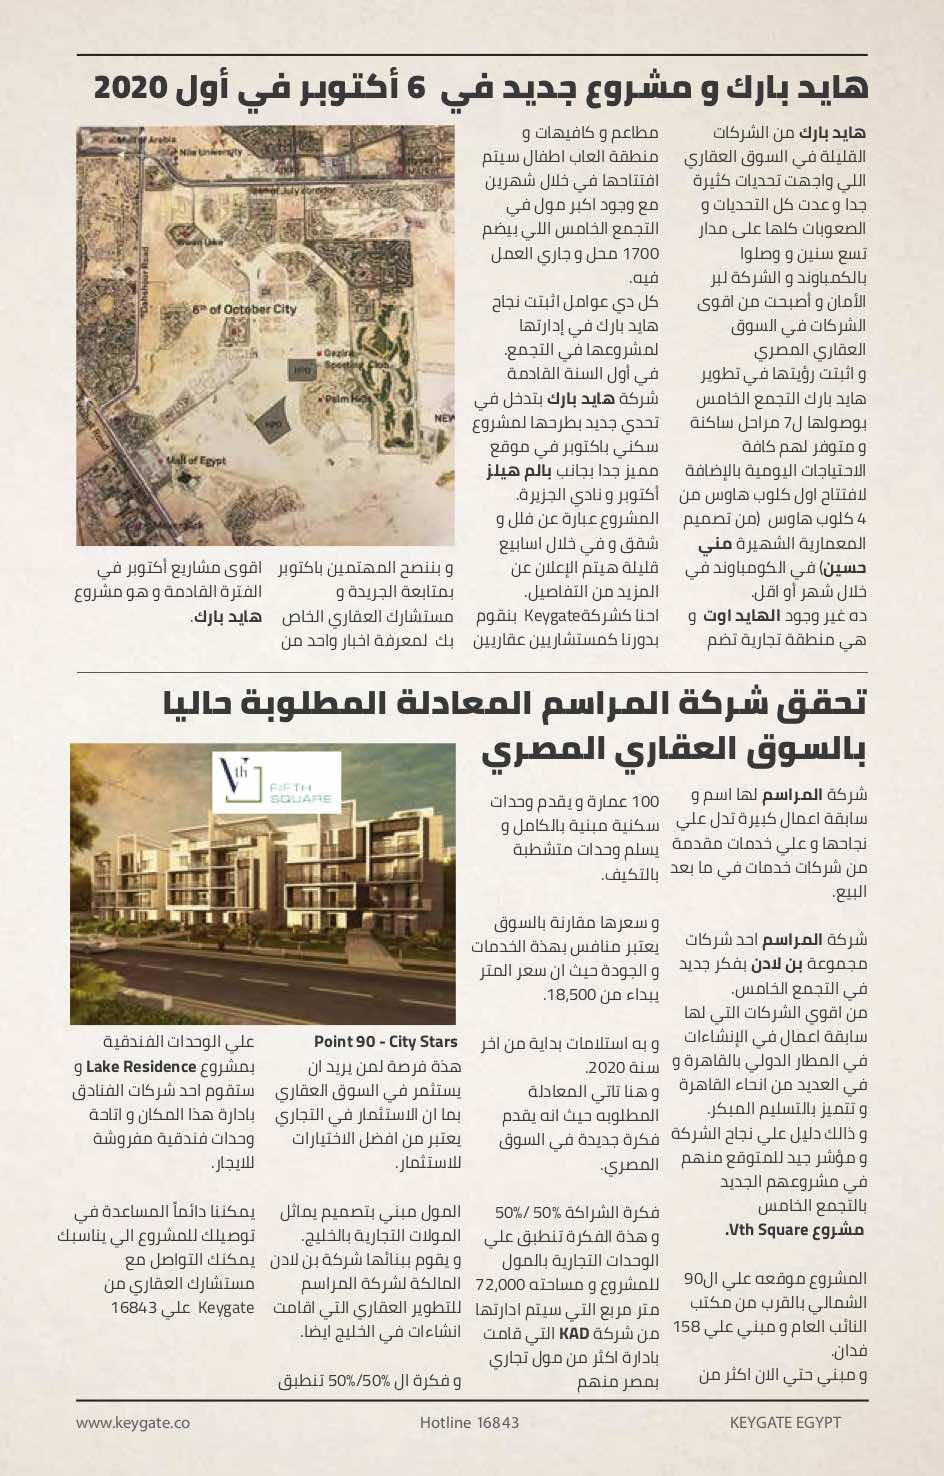 KeyGate Real Estate' Newspaper 18 Oct 2019 2.0